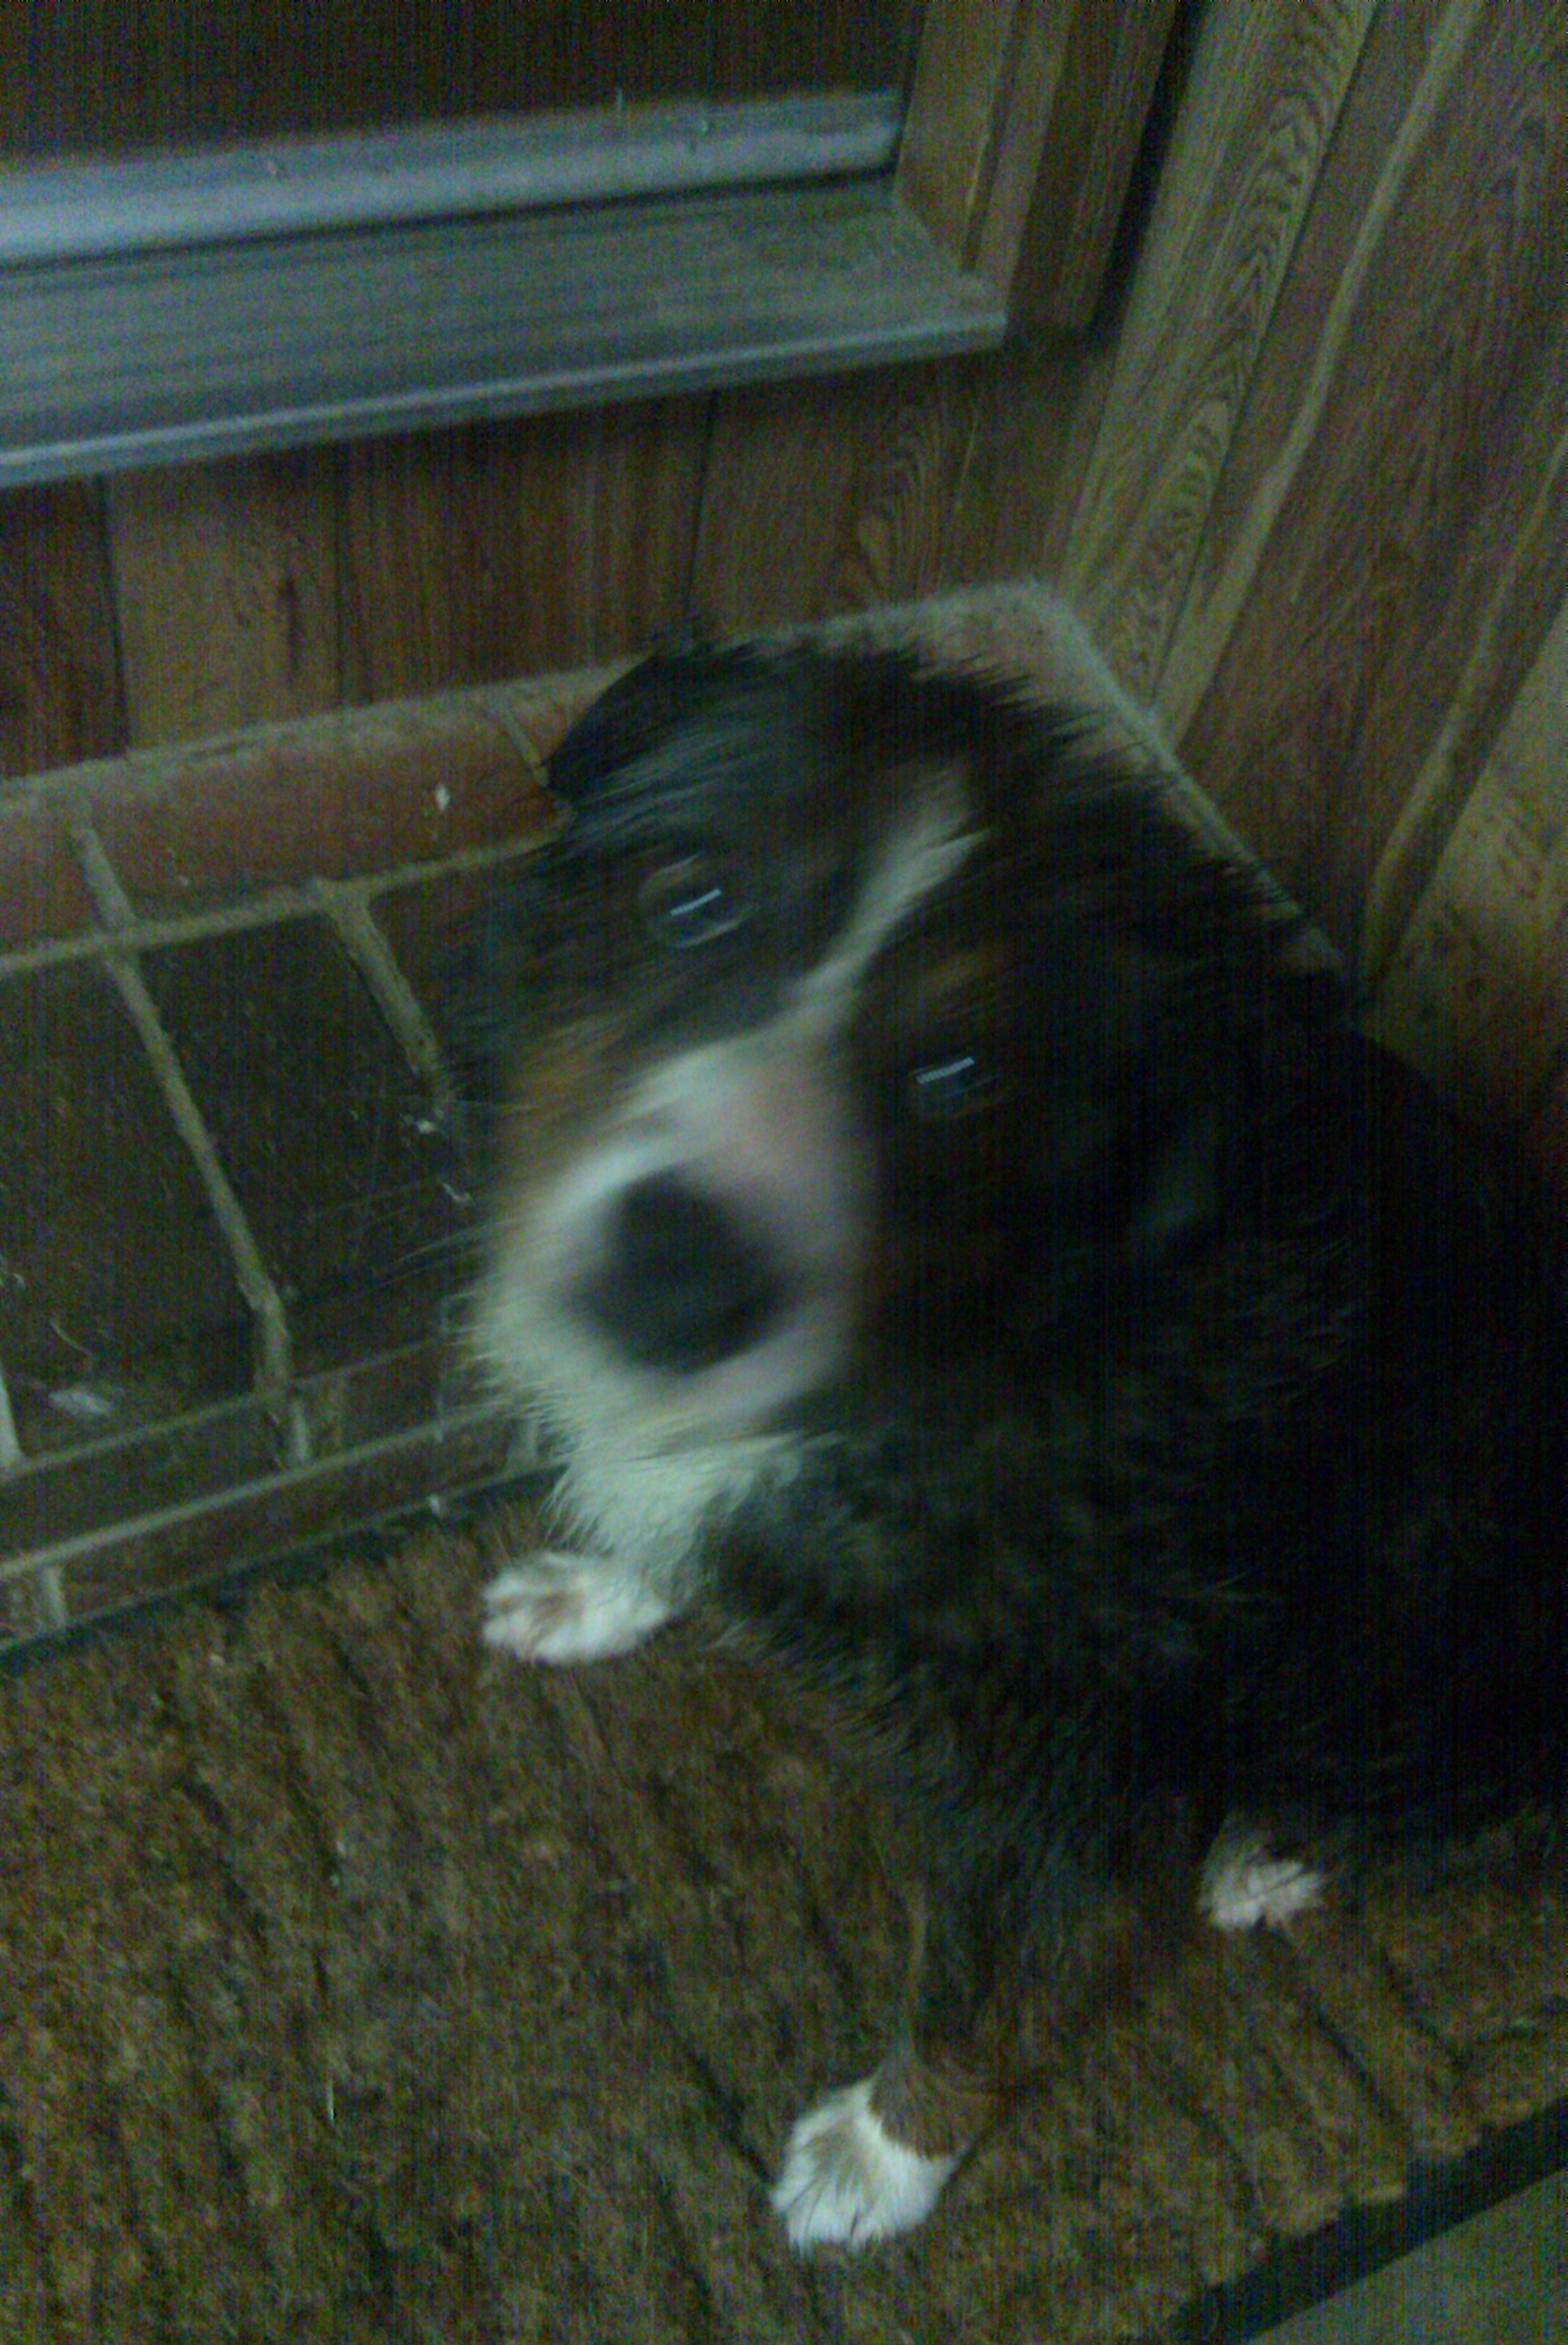 Aussie ~ a very wet, unhappy Australian Shepherd....:)